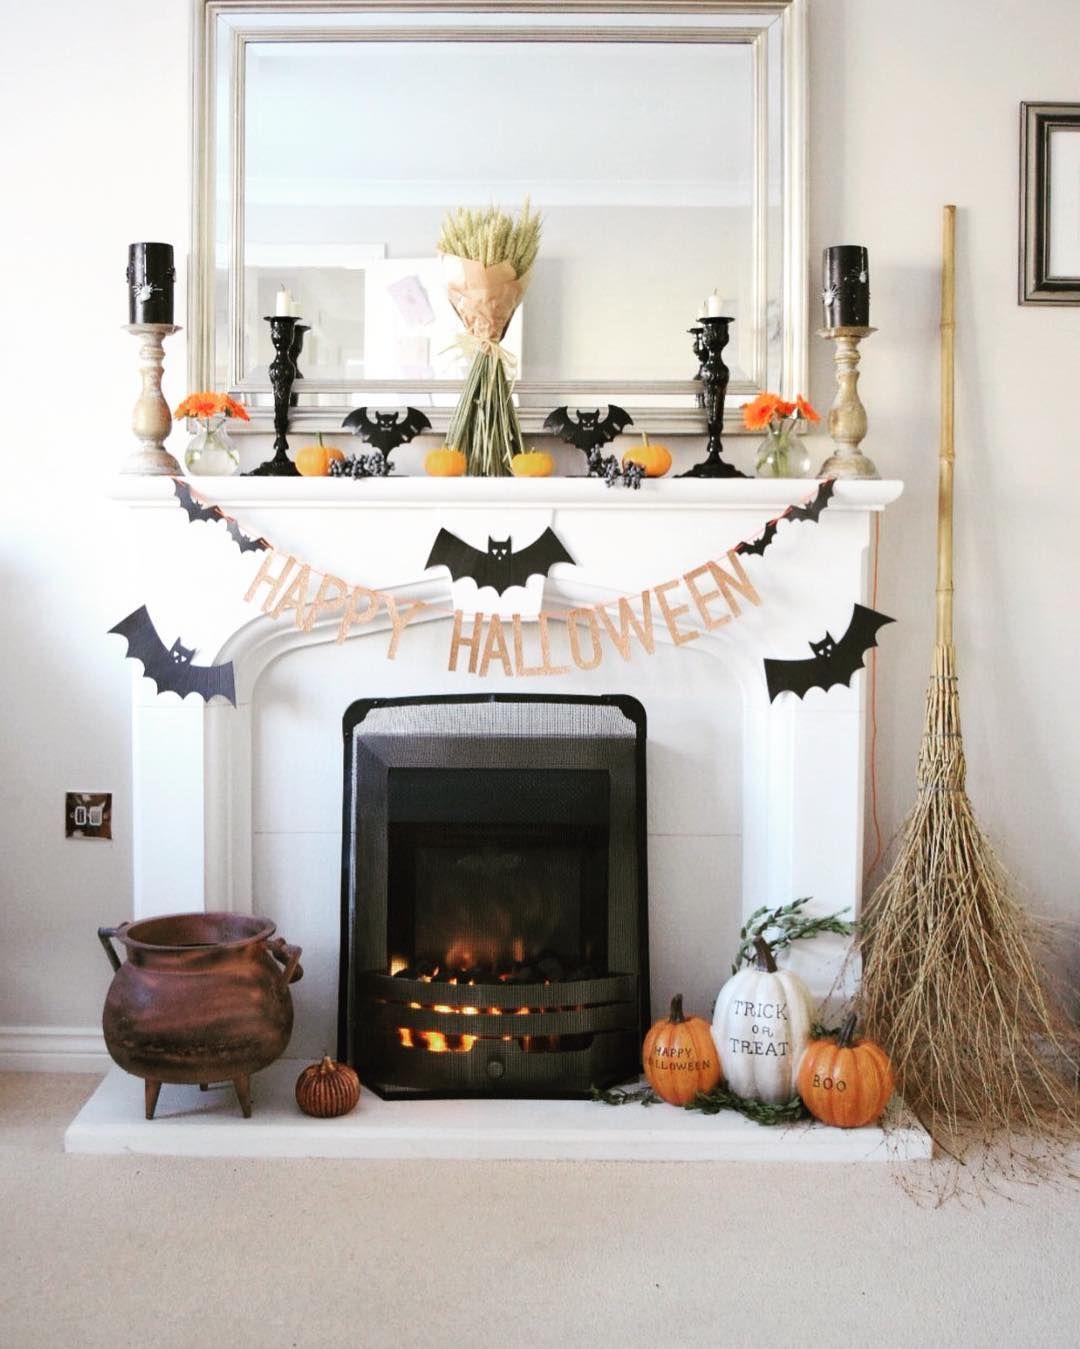 50+ Unique Halloween Party Decorating Ideas That'll Floor